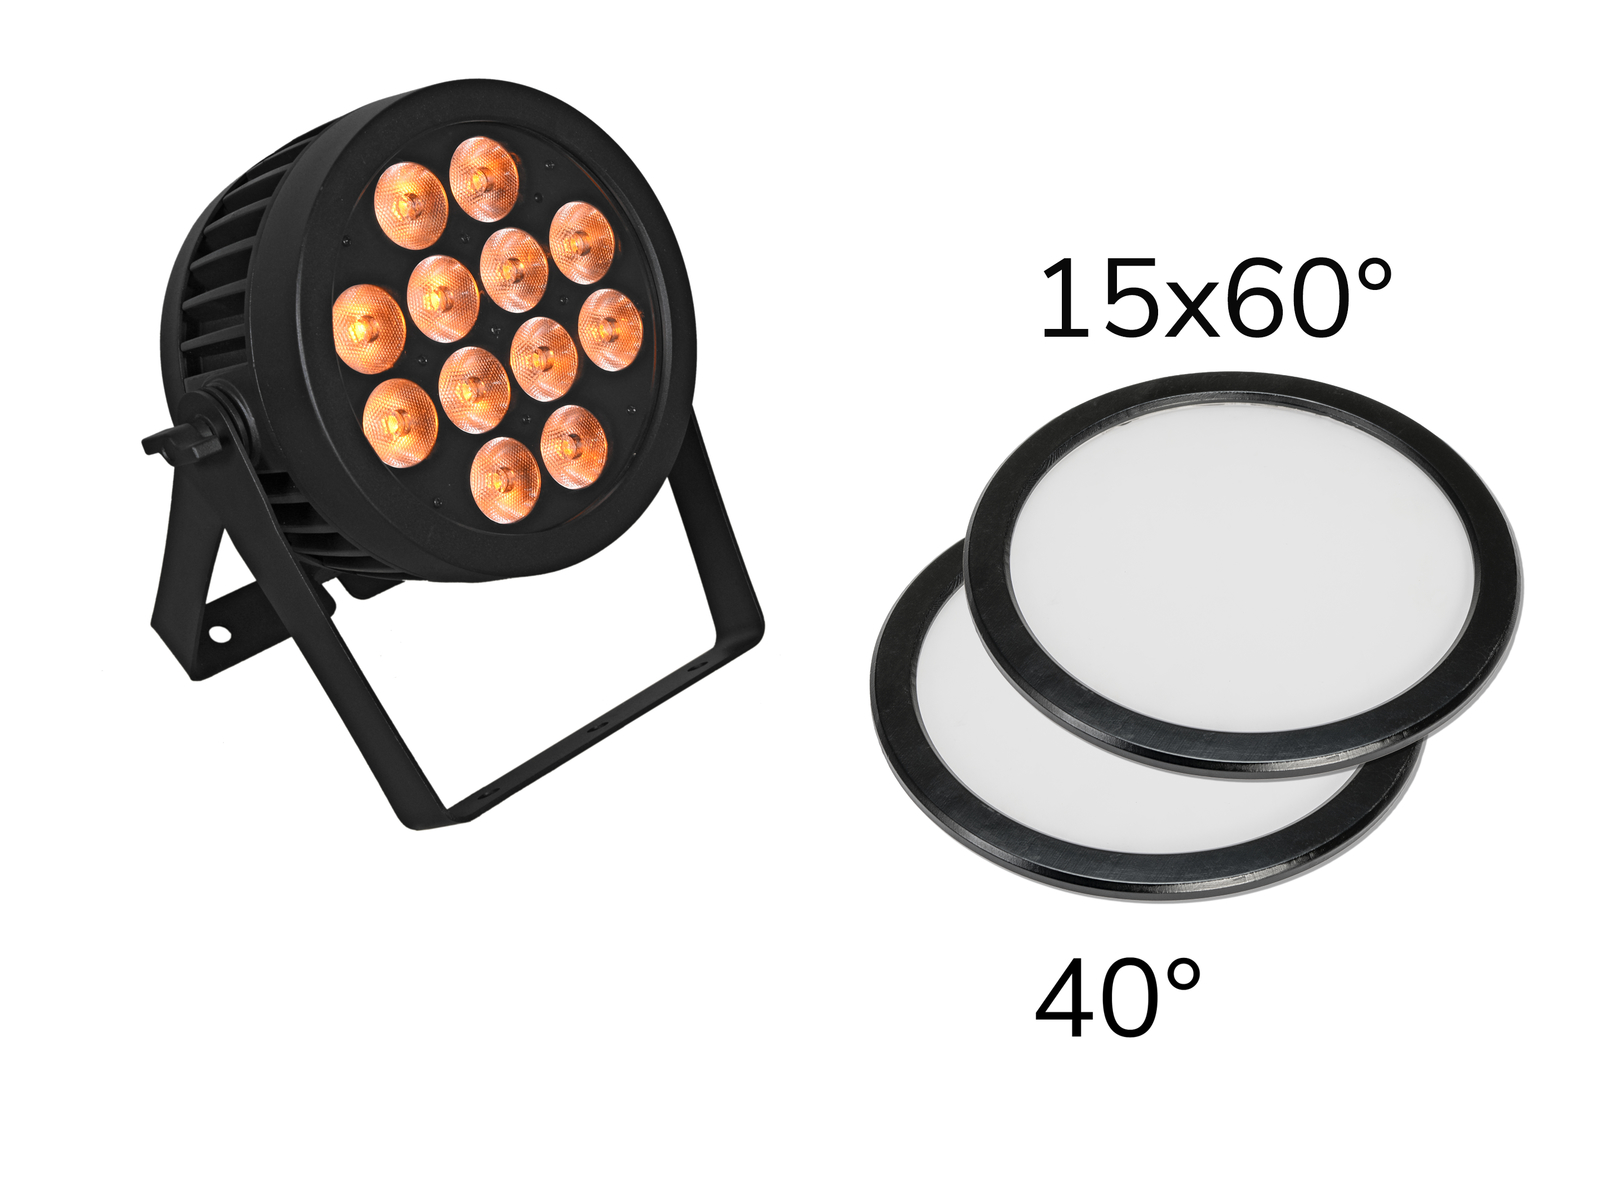 EUROLITE Set LED IP PAR 12x8W QCL Spot + 2x Diffusorscheibe (15x60° und 40°)